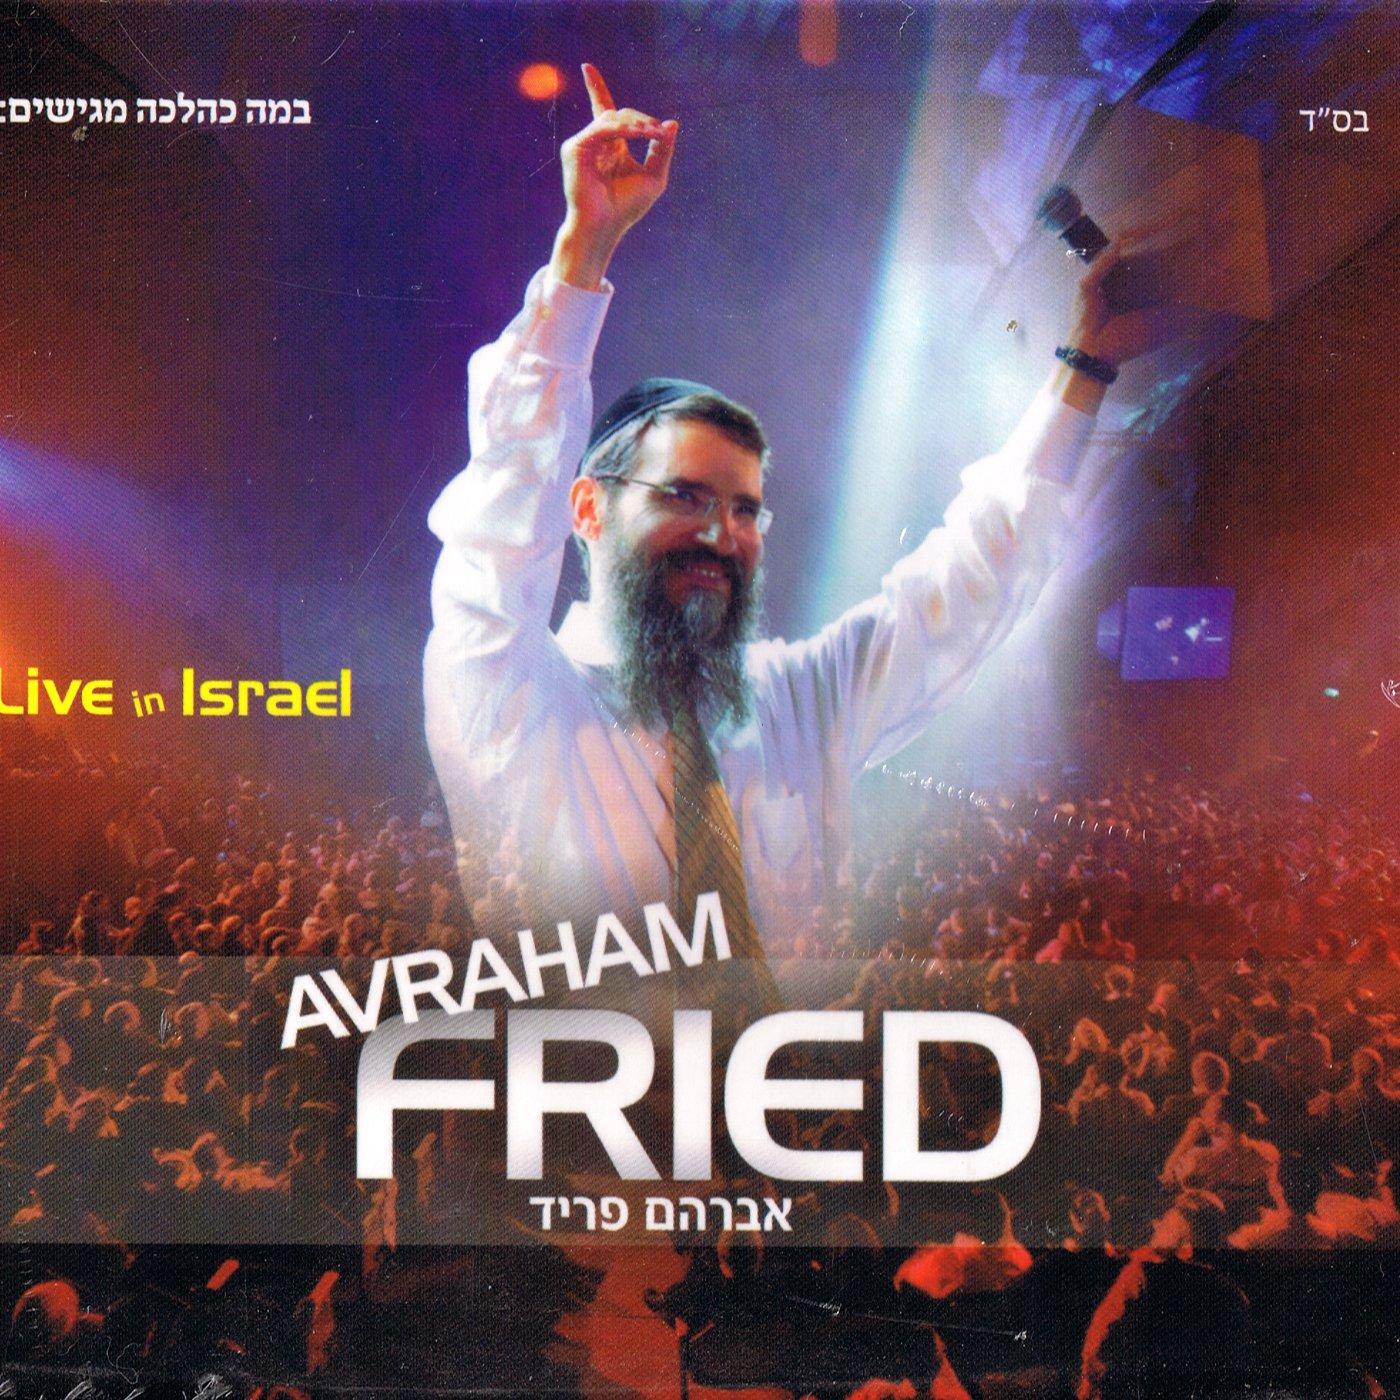 Live in Israel [2CD's Set]